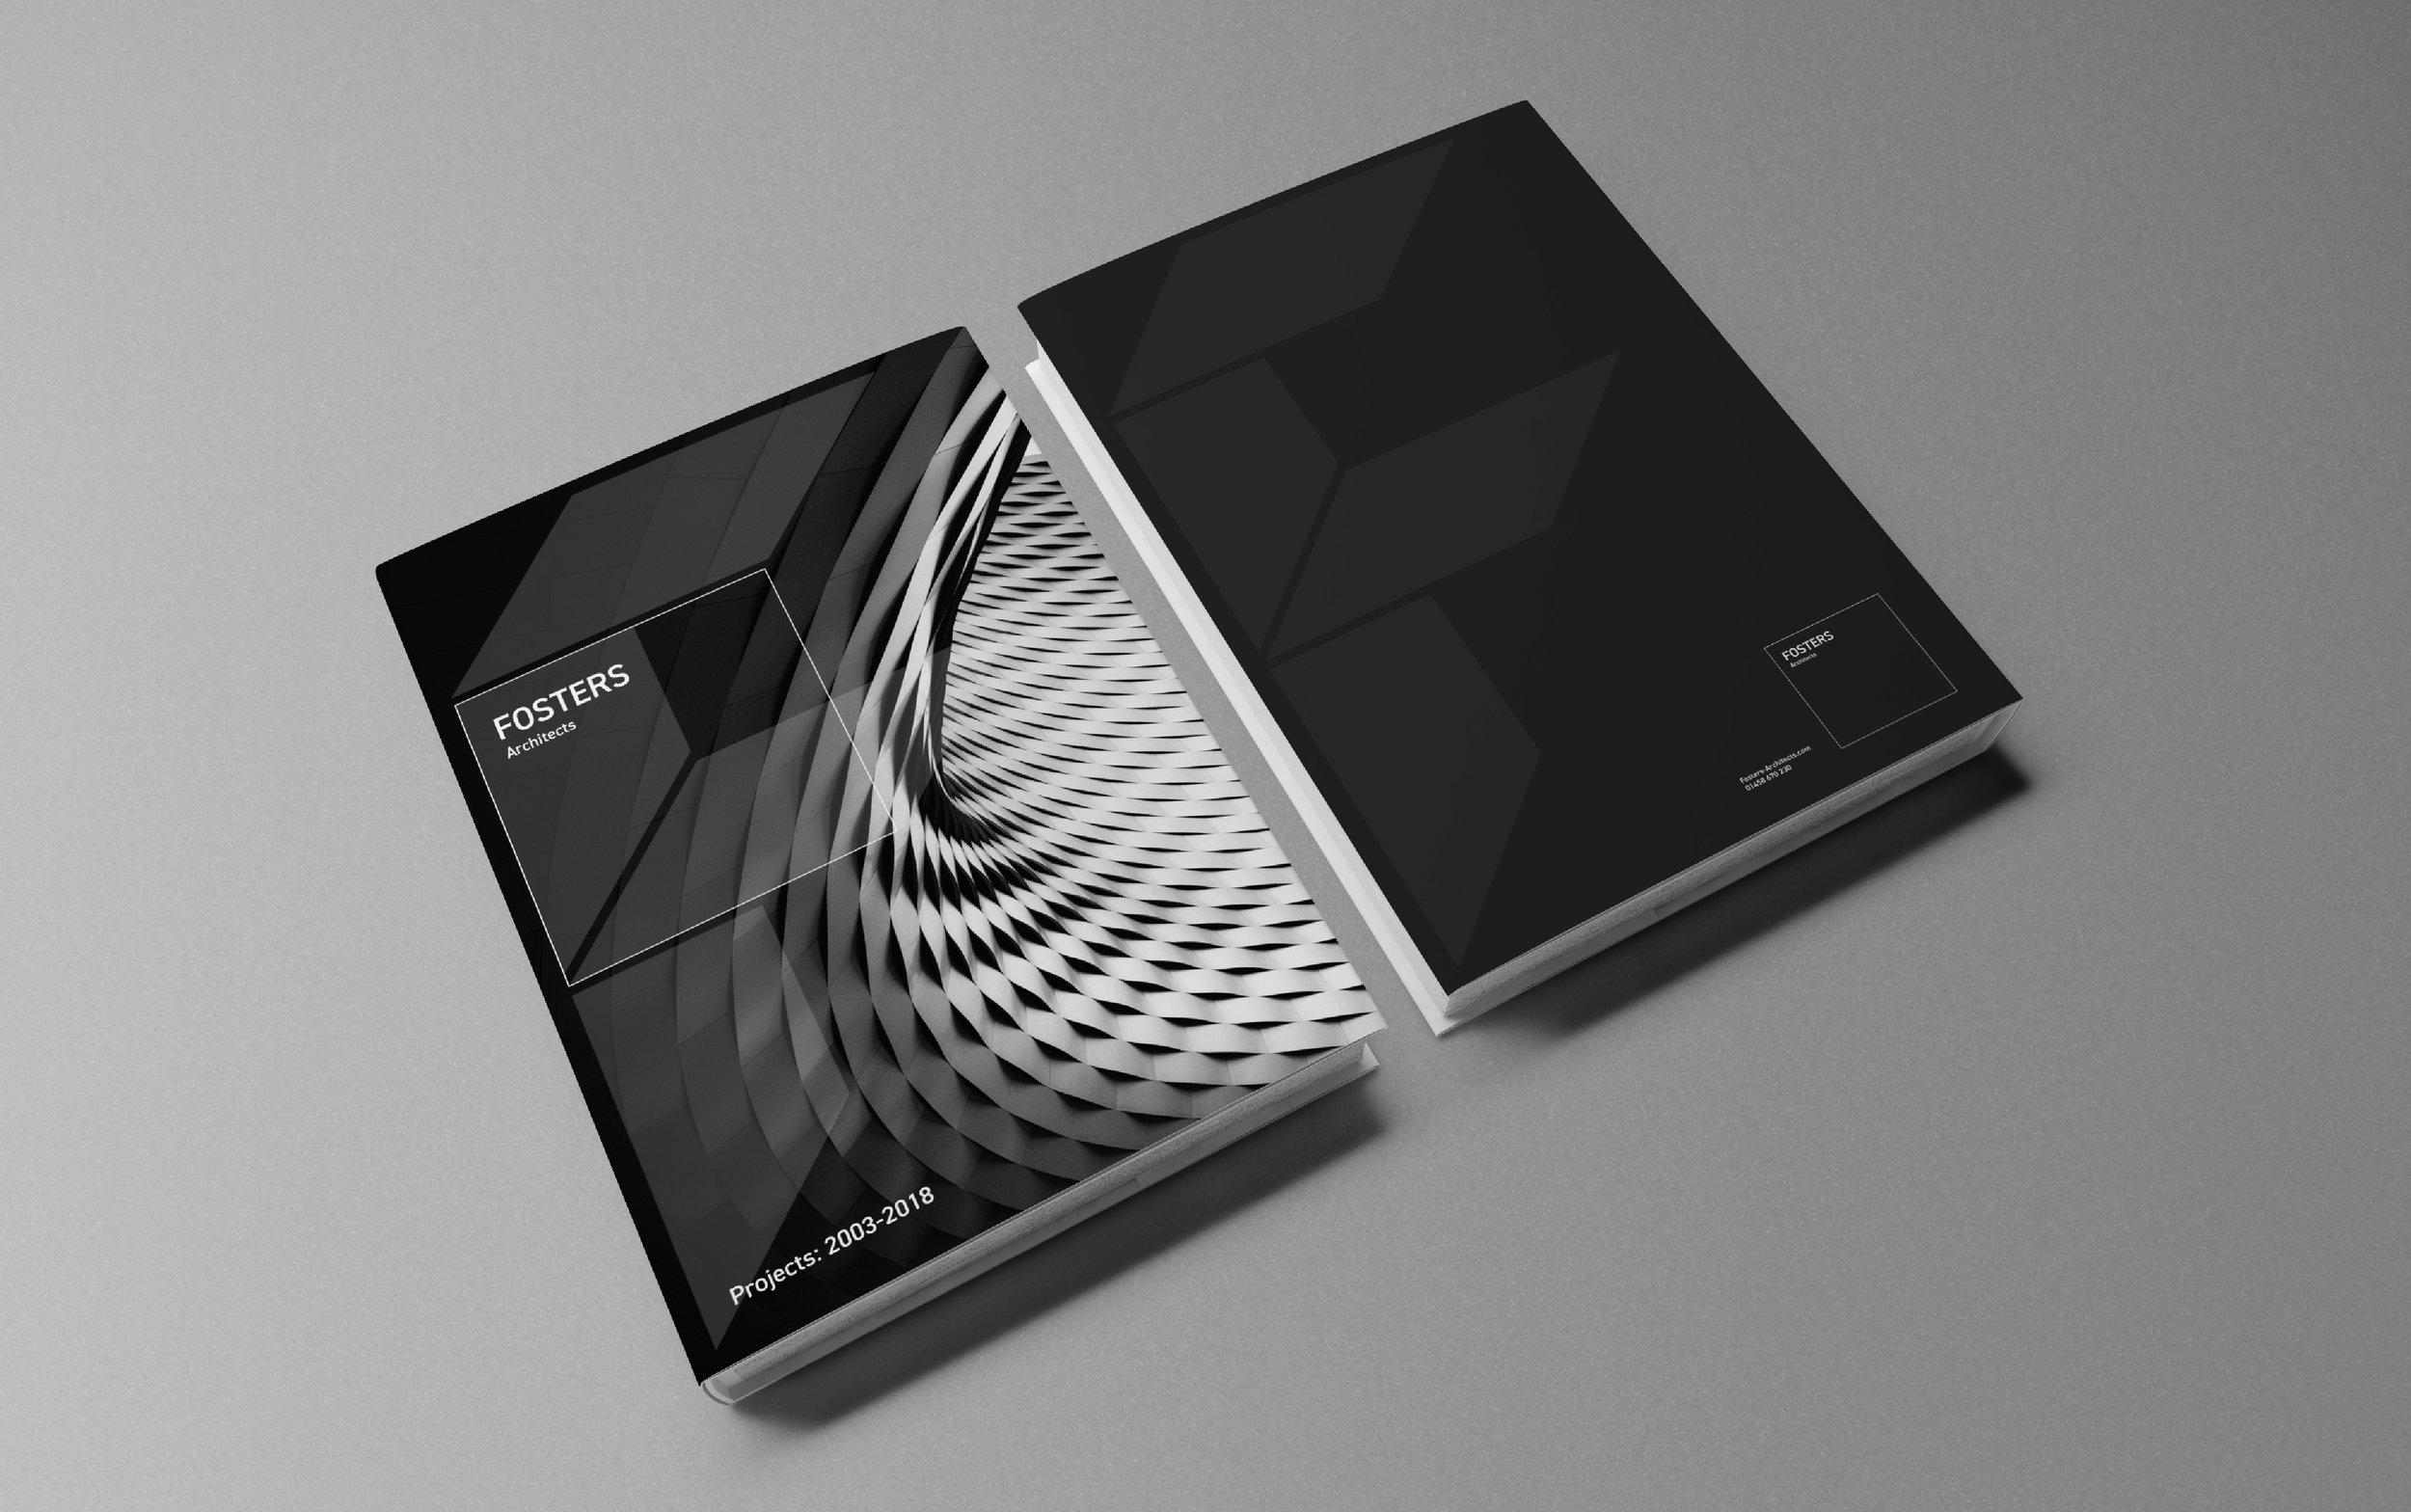 fosters architects presentation-02.jpg